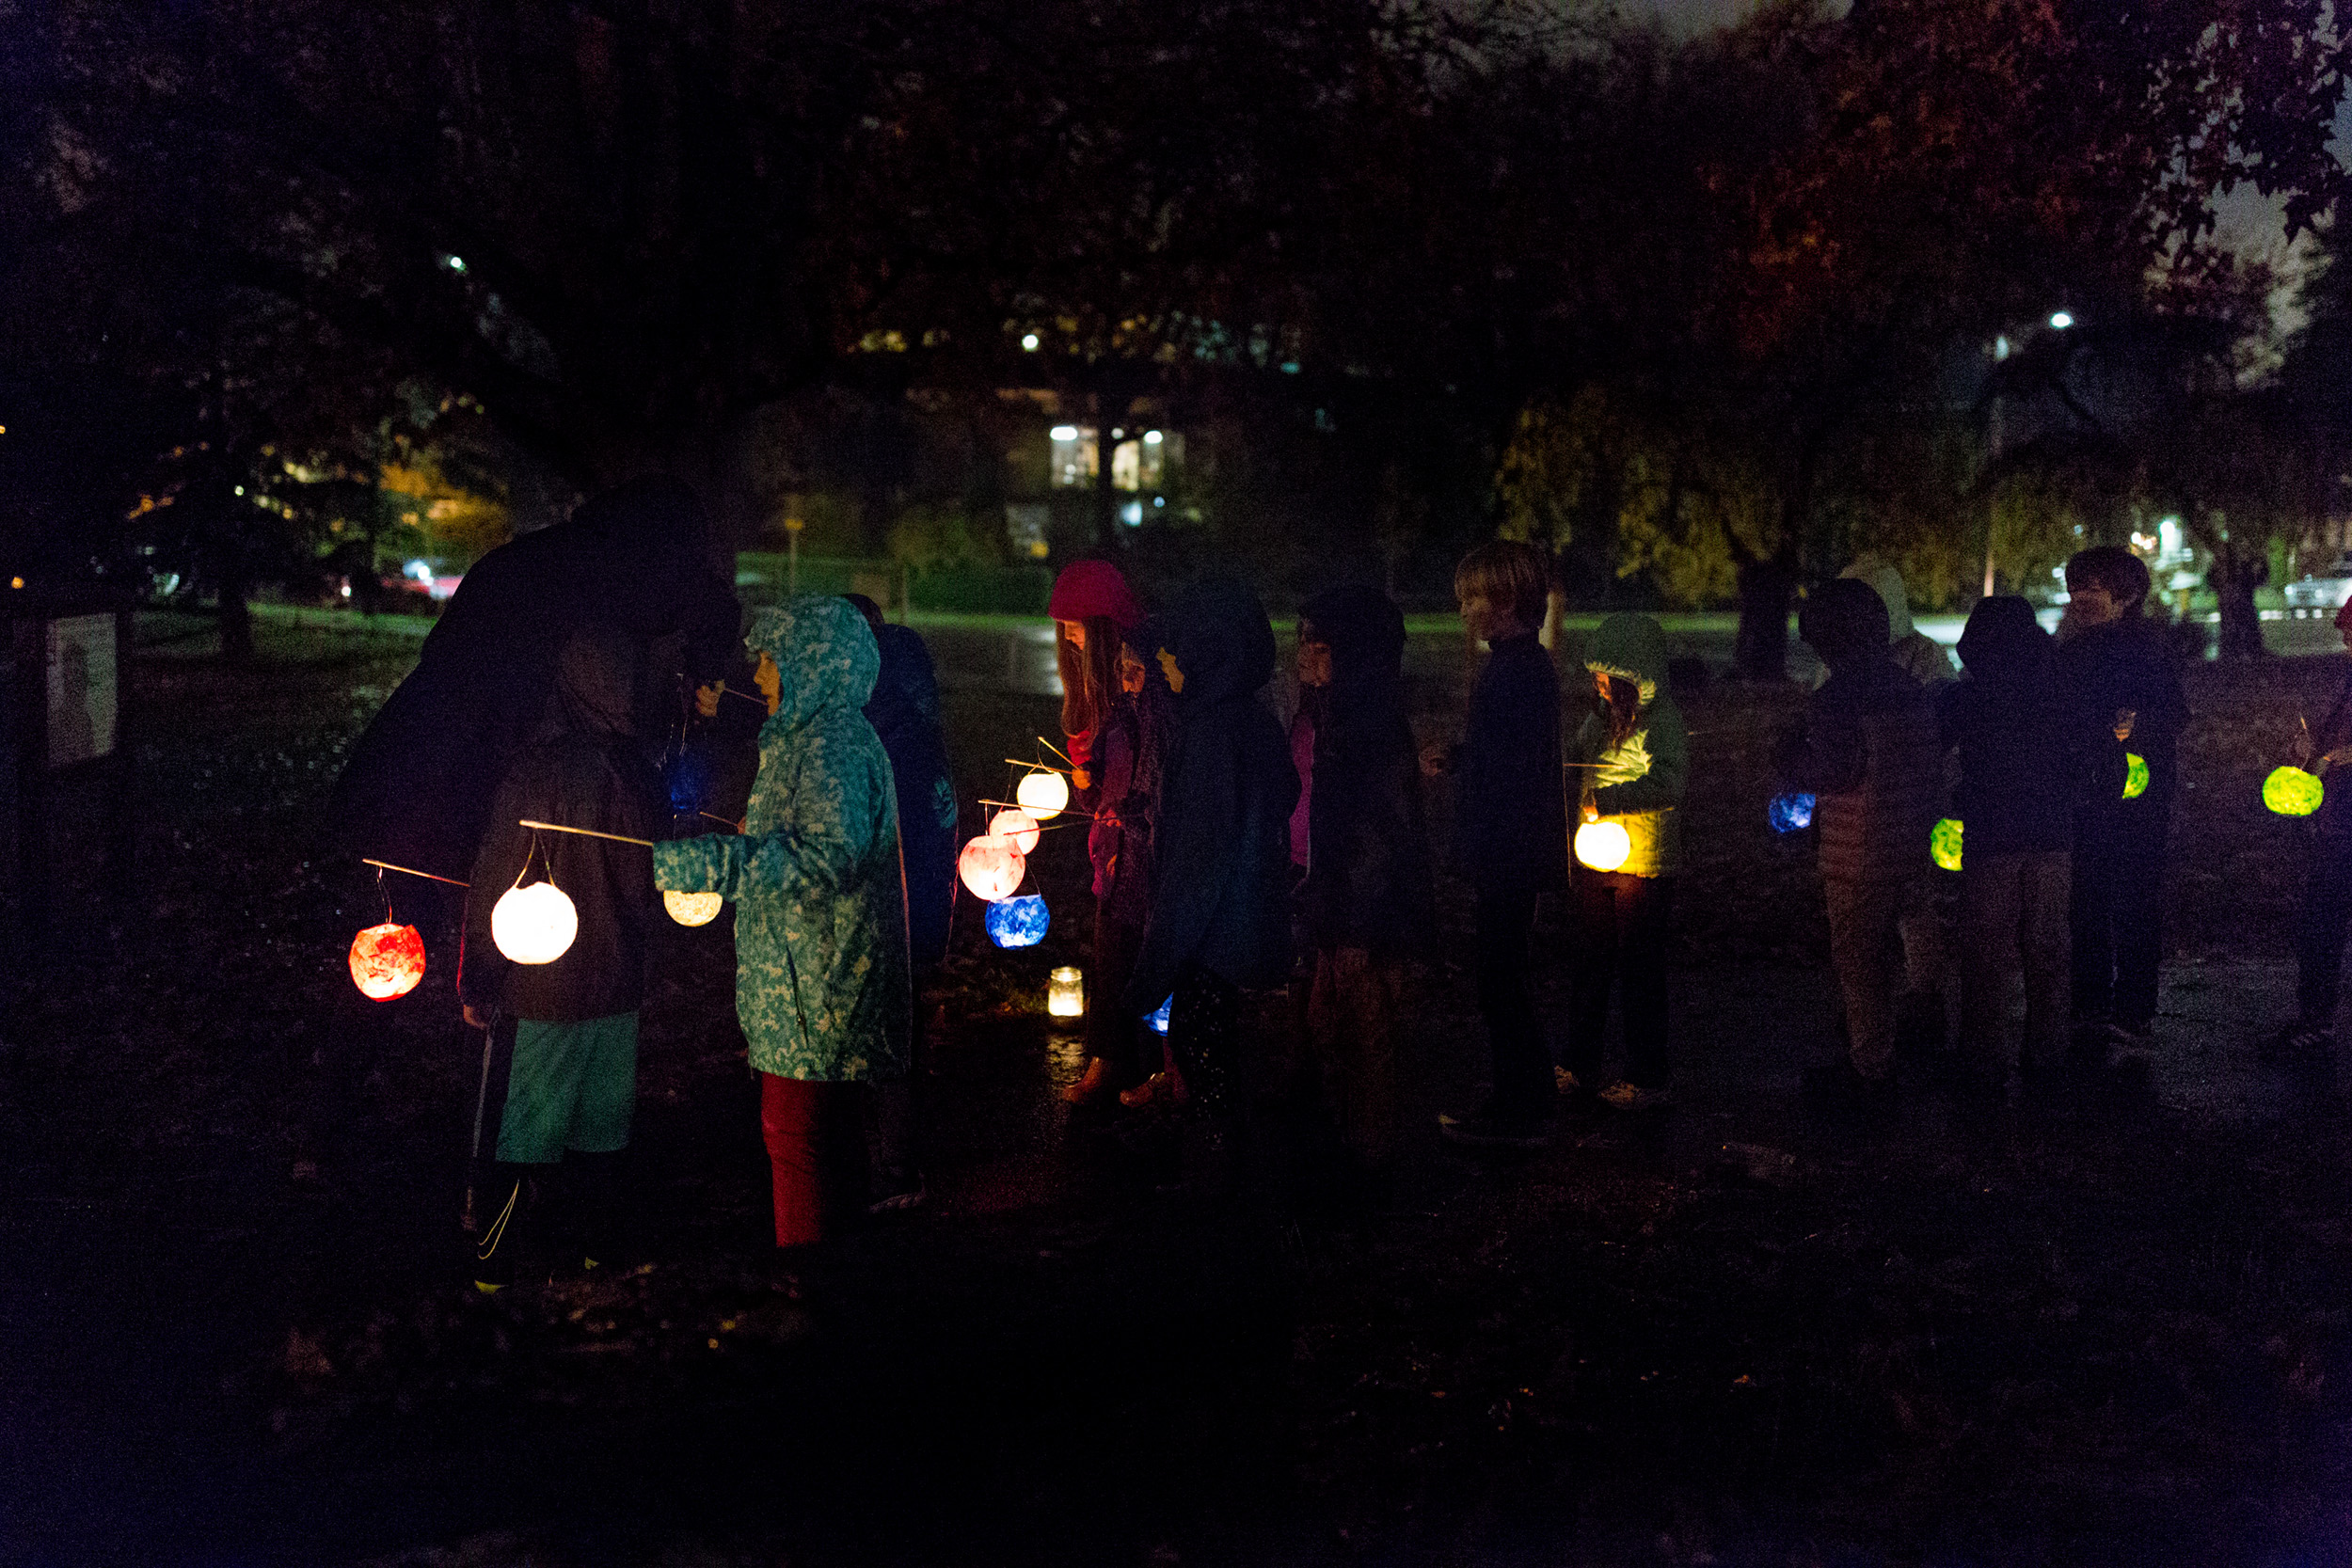 teacher relighting a extinguished lantern